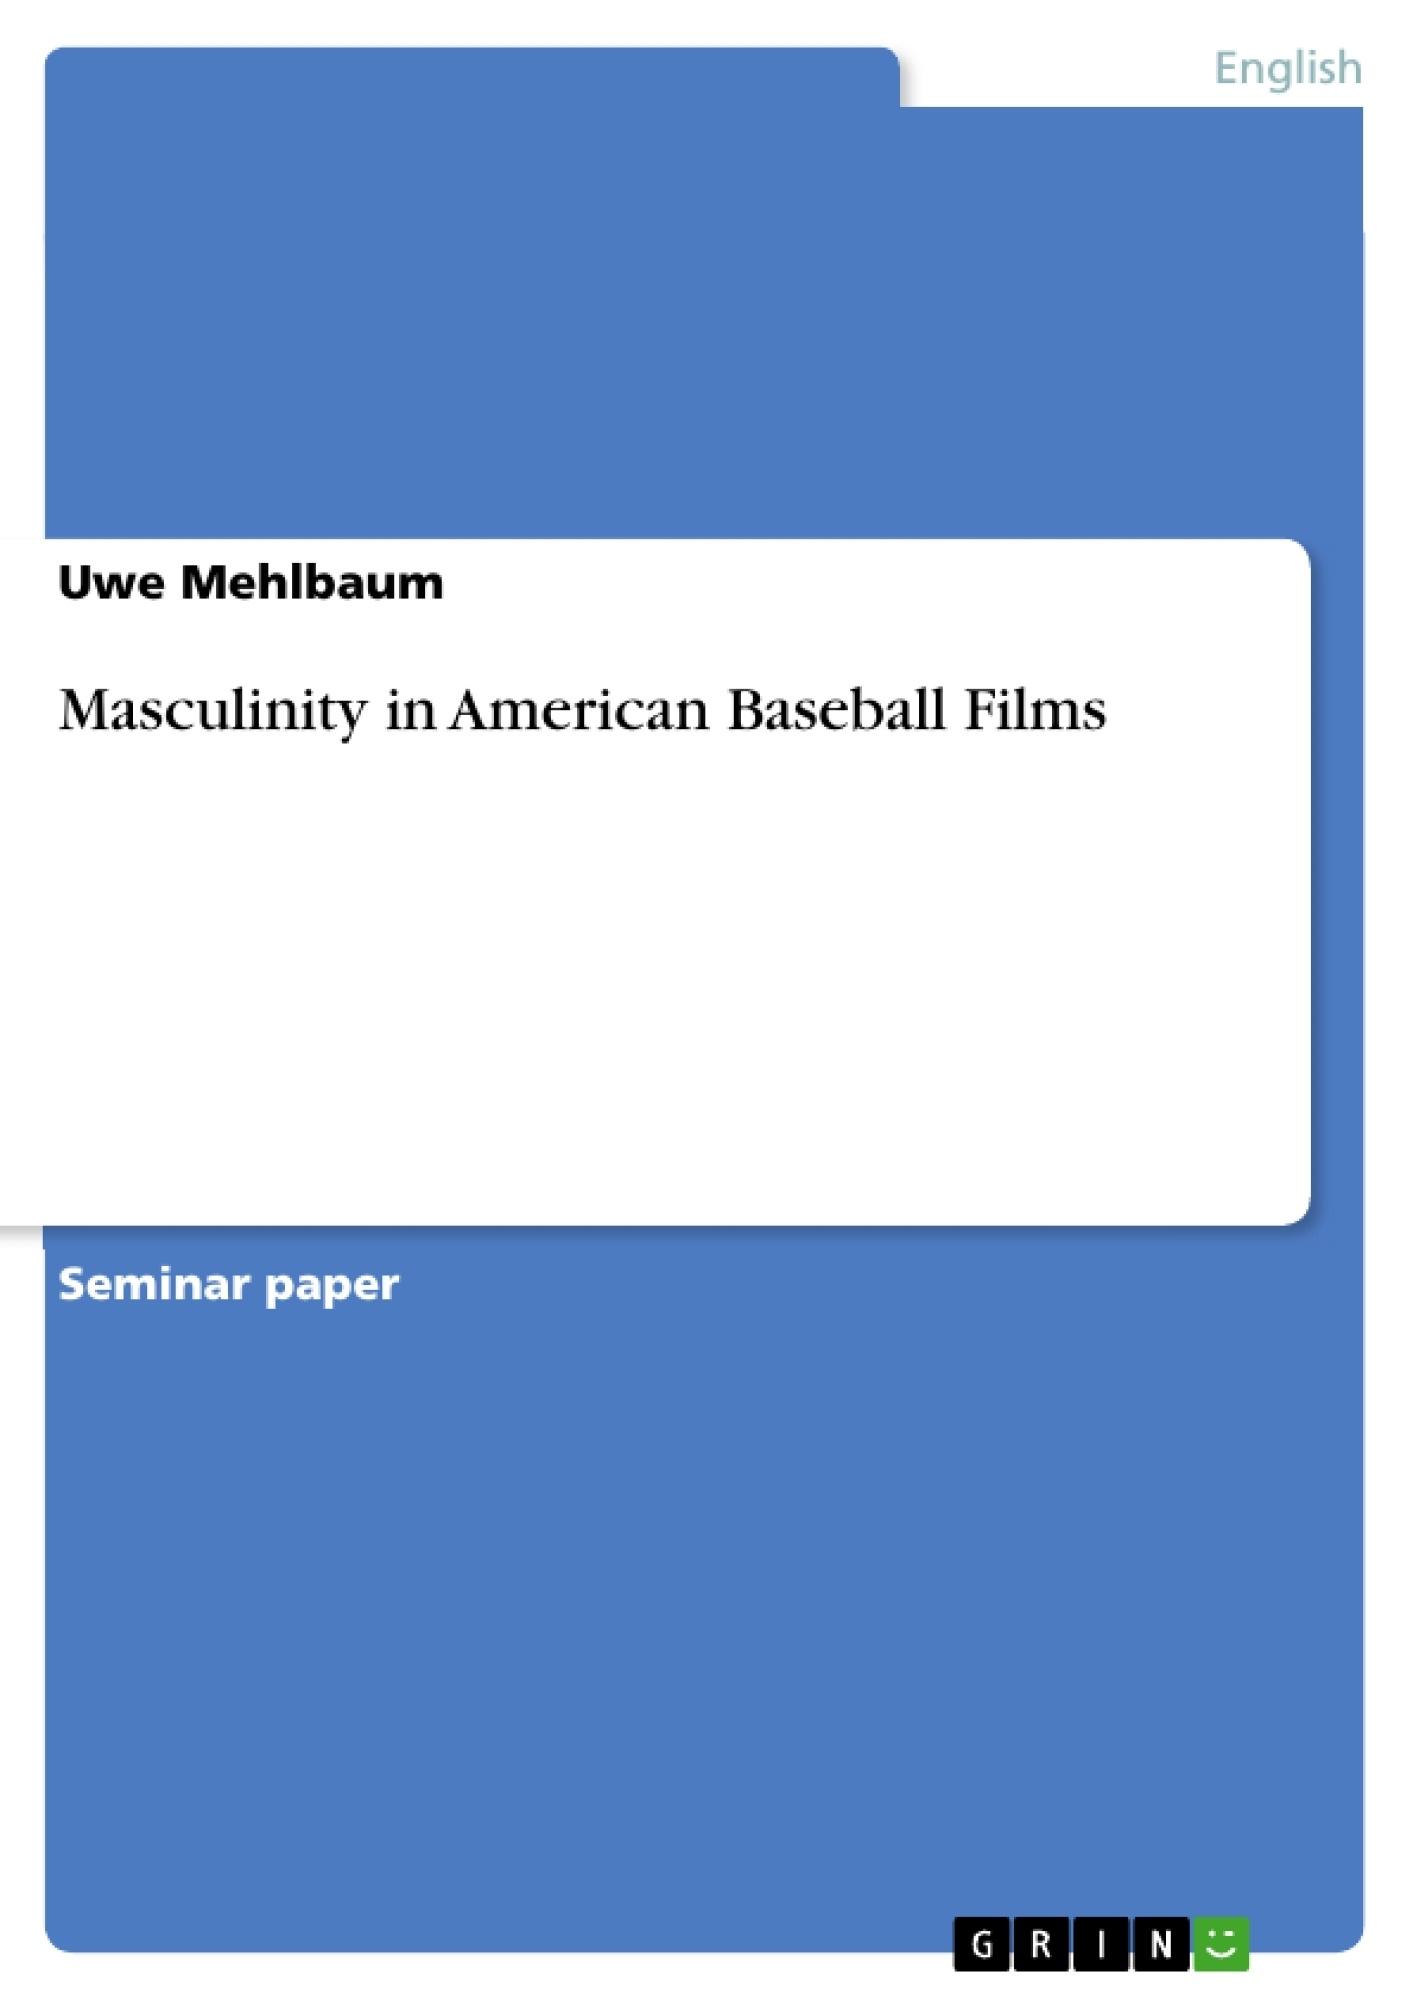 Title: Masculinity in American Baseball Films